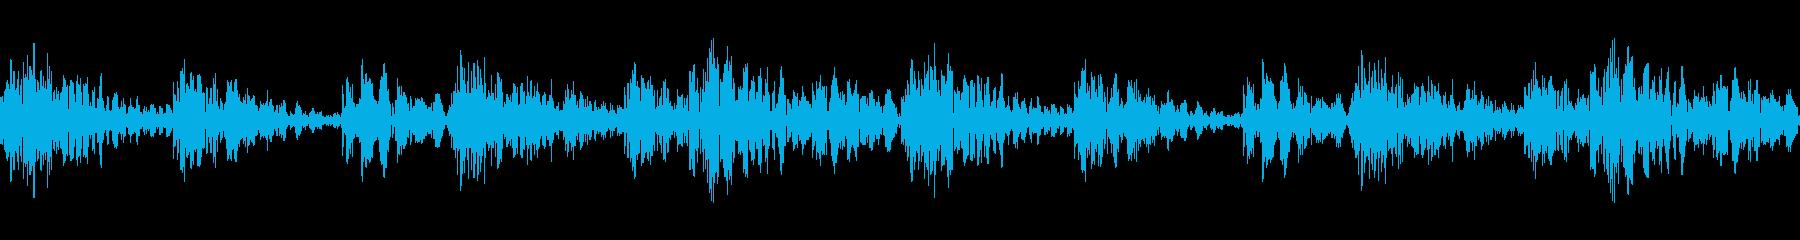 CoolJapan!! 和太鼓ビートの再生済みの波形